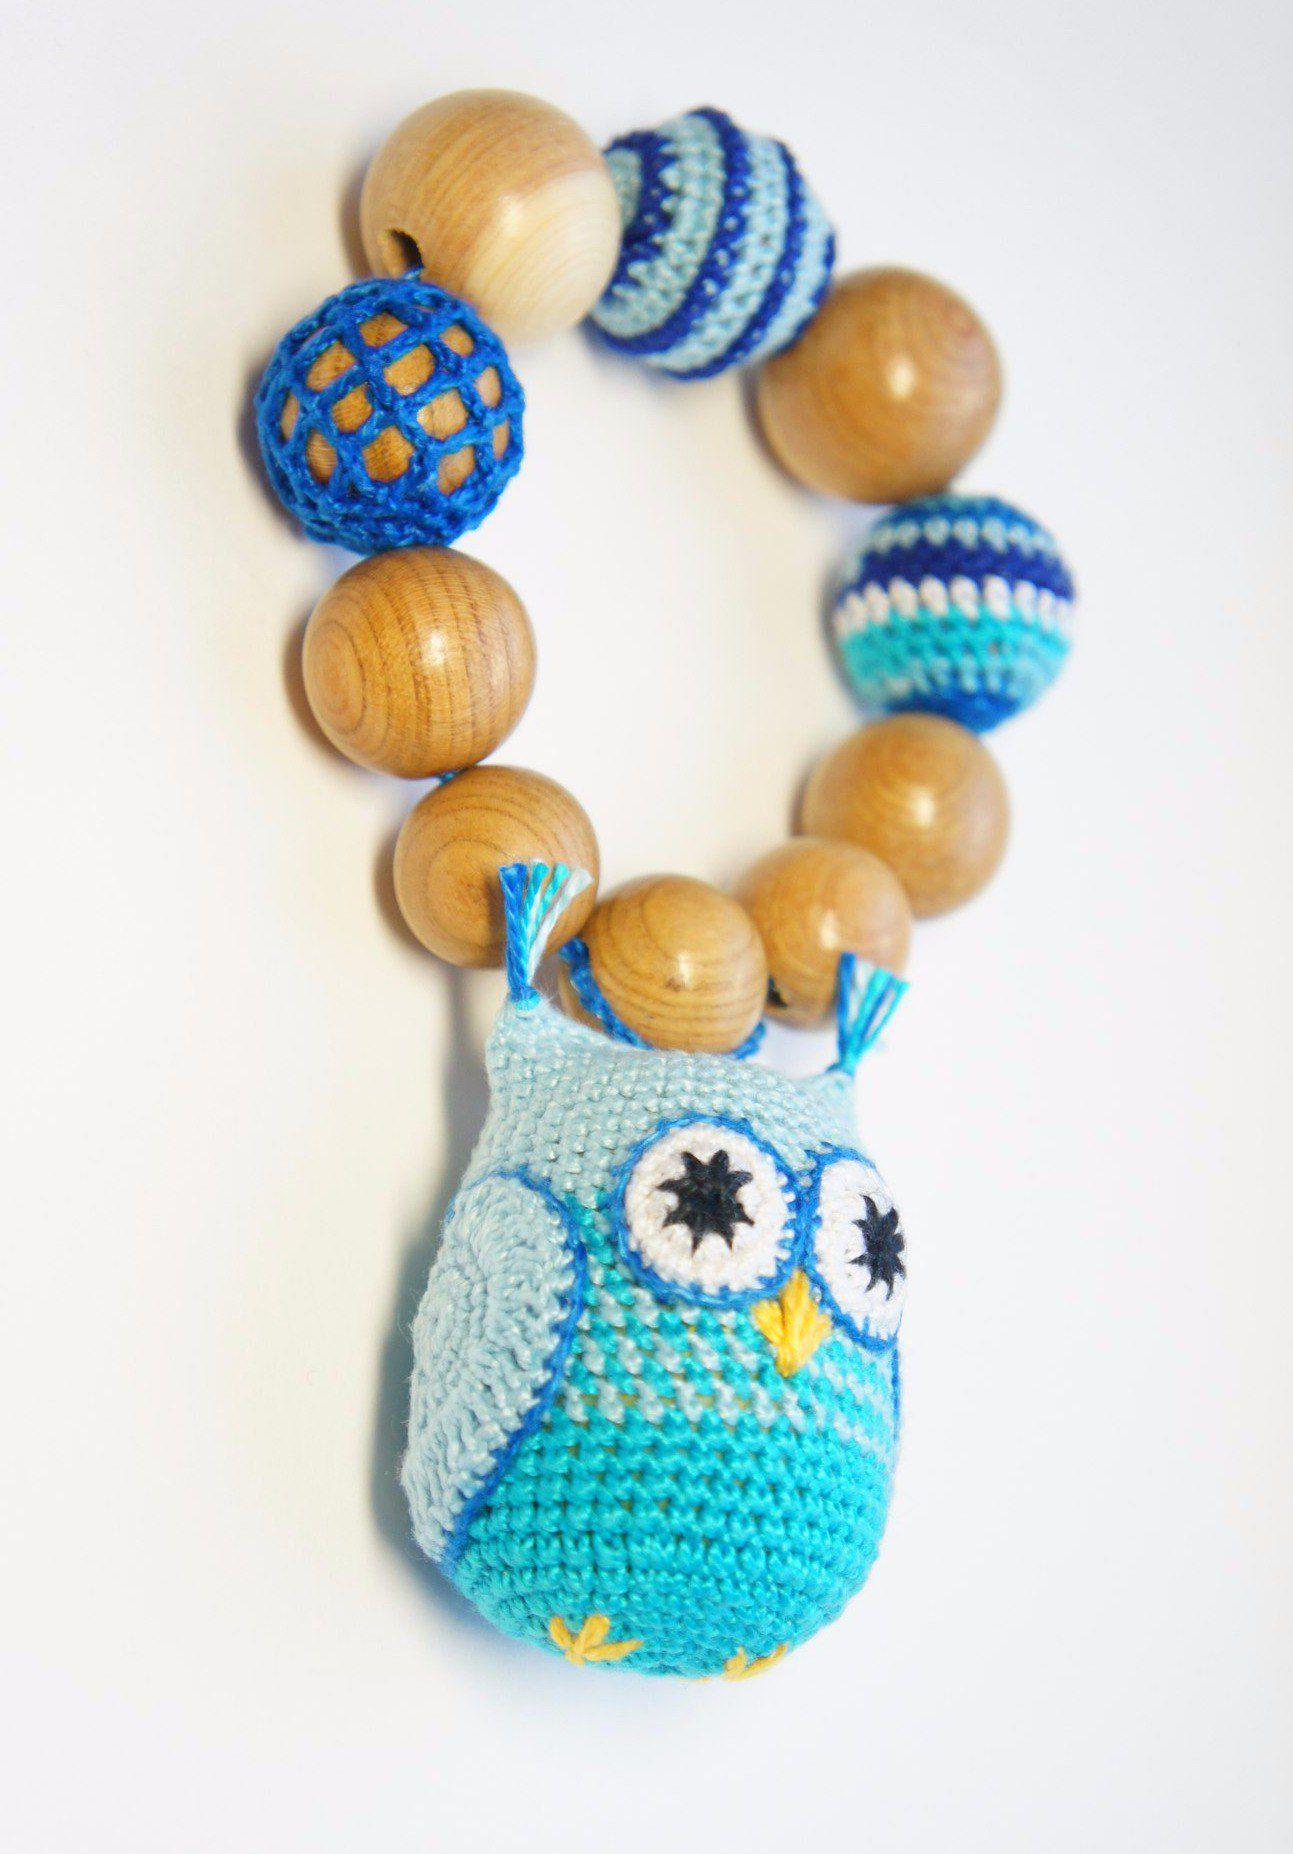 бусы игрушка подвеска мамабусы погремушка слингобусы дерево грызунок можжевельник кроватка коляска